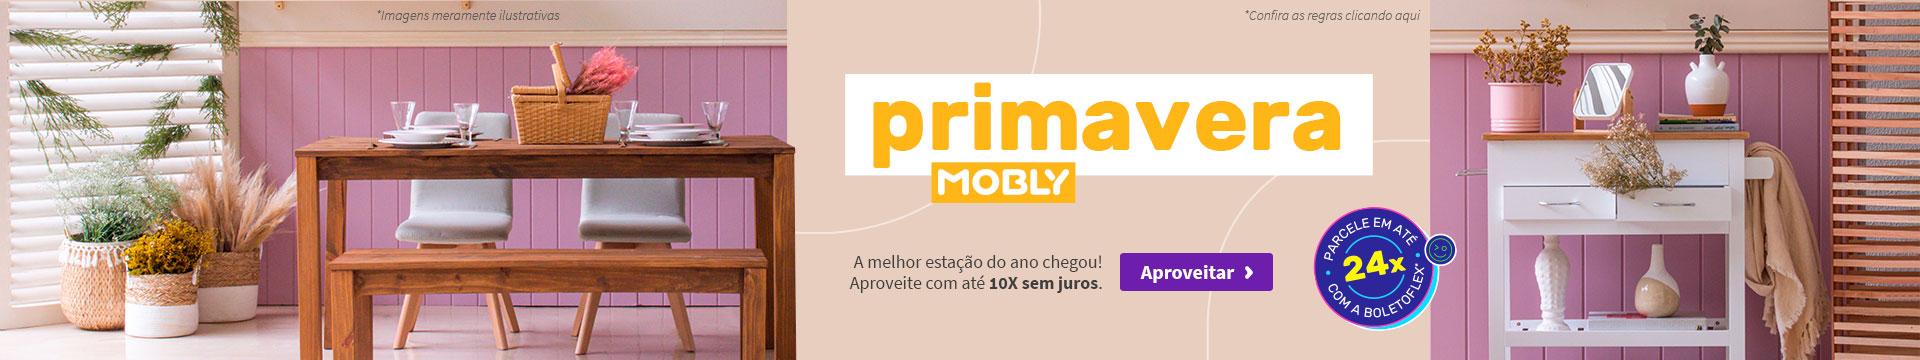 Primavera Mobly